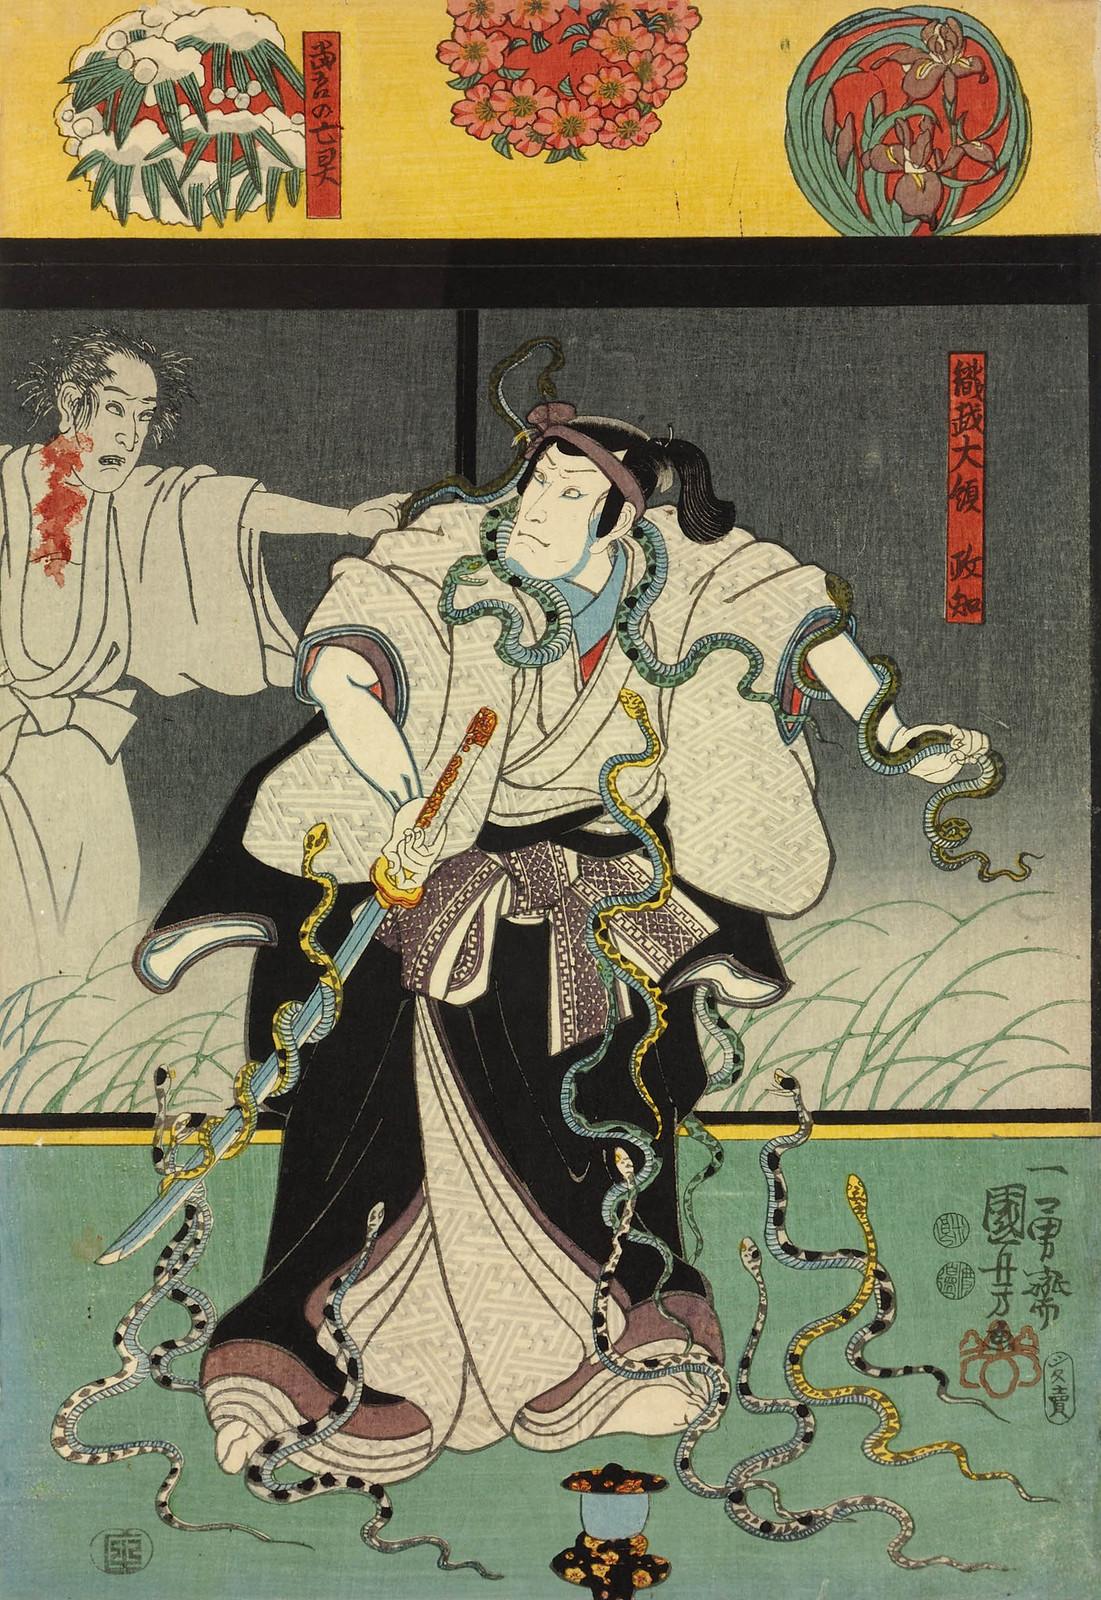 Utagawa Kuniyoshi - Orikoshi Masatomo (centre) (played by Bando Hikosaburo IV) is attacked by the ghost of Asakura Togo 1853 (middle panel)